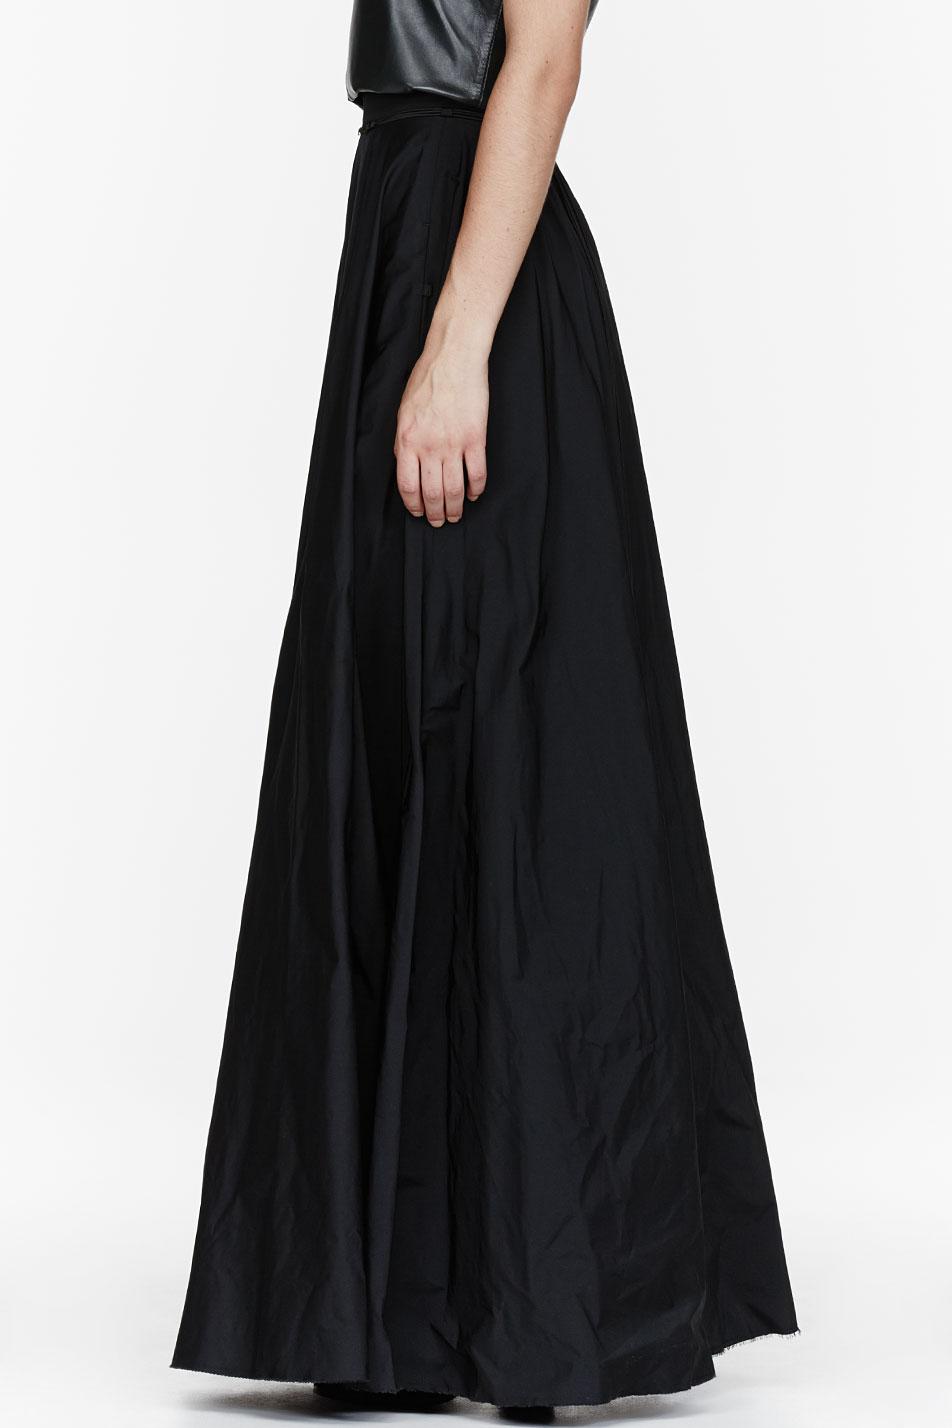 Yang Li Black Floor Length Circle Skirt In Black | Lyst